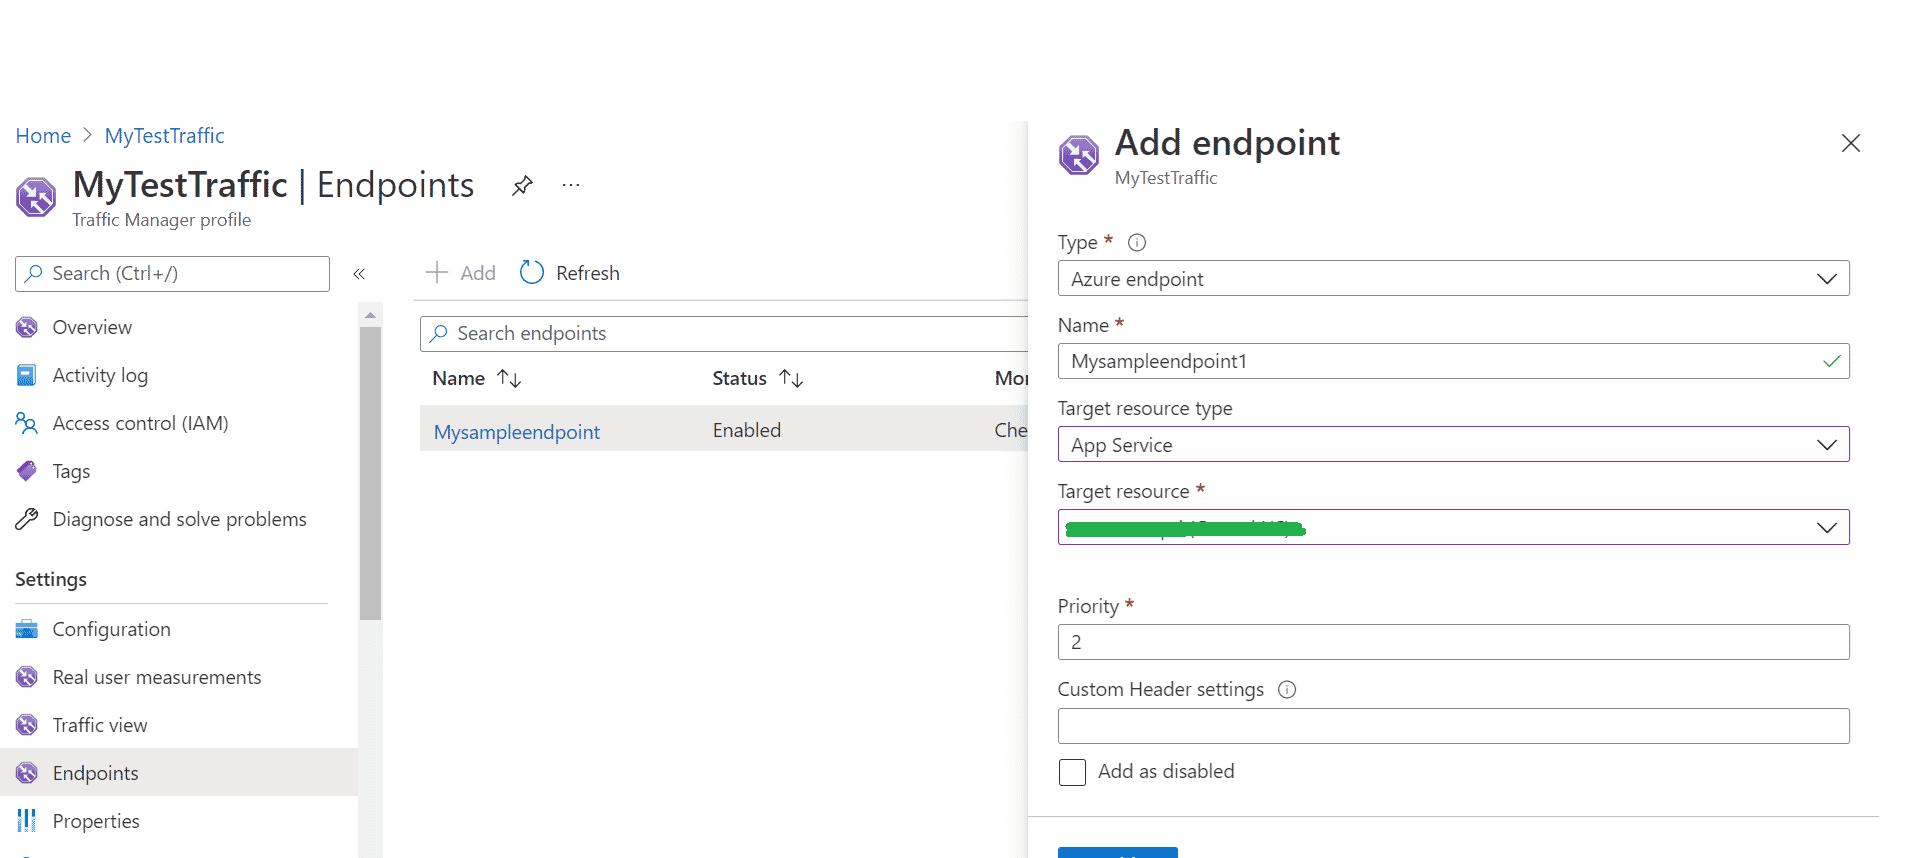 Azure Endpoint Details